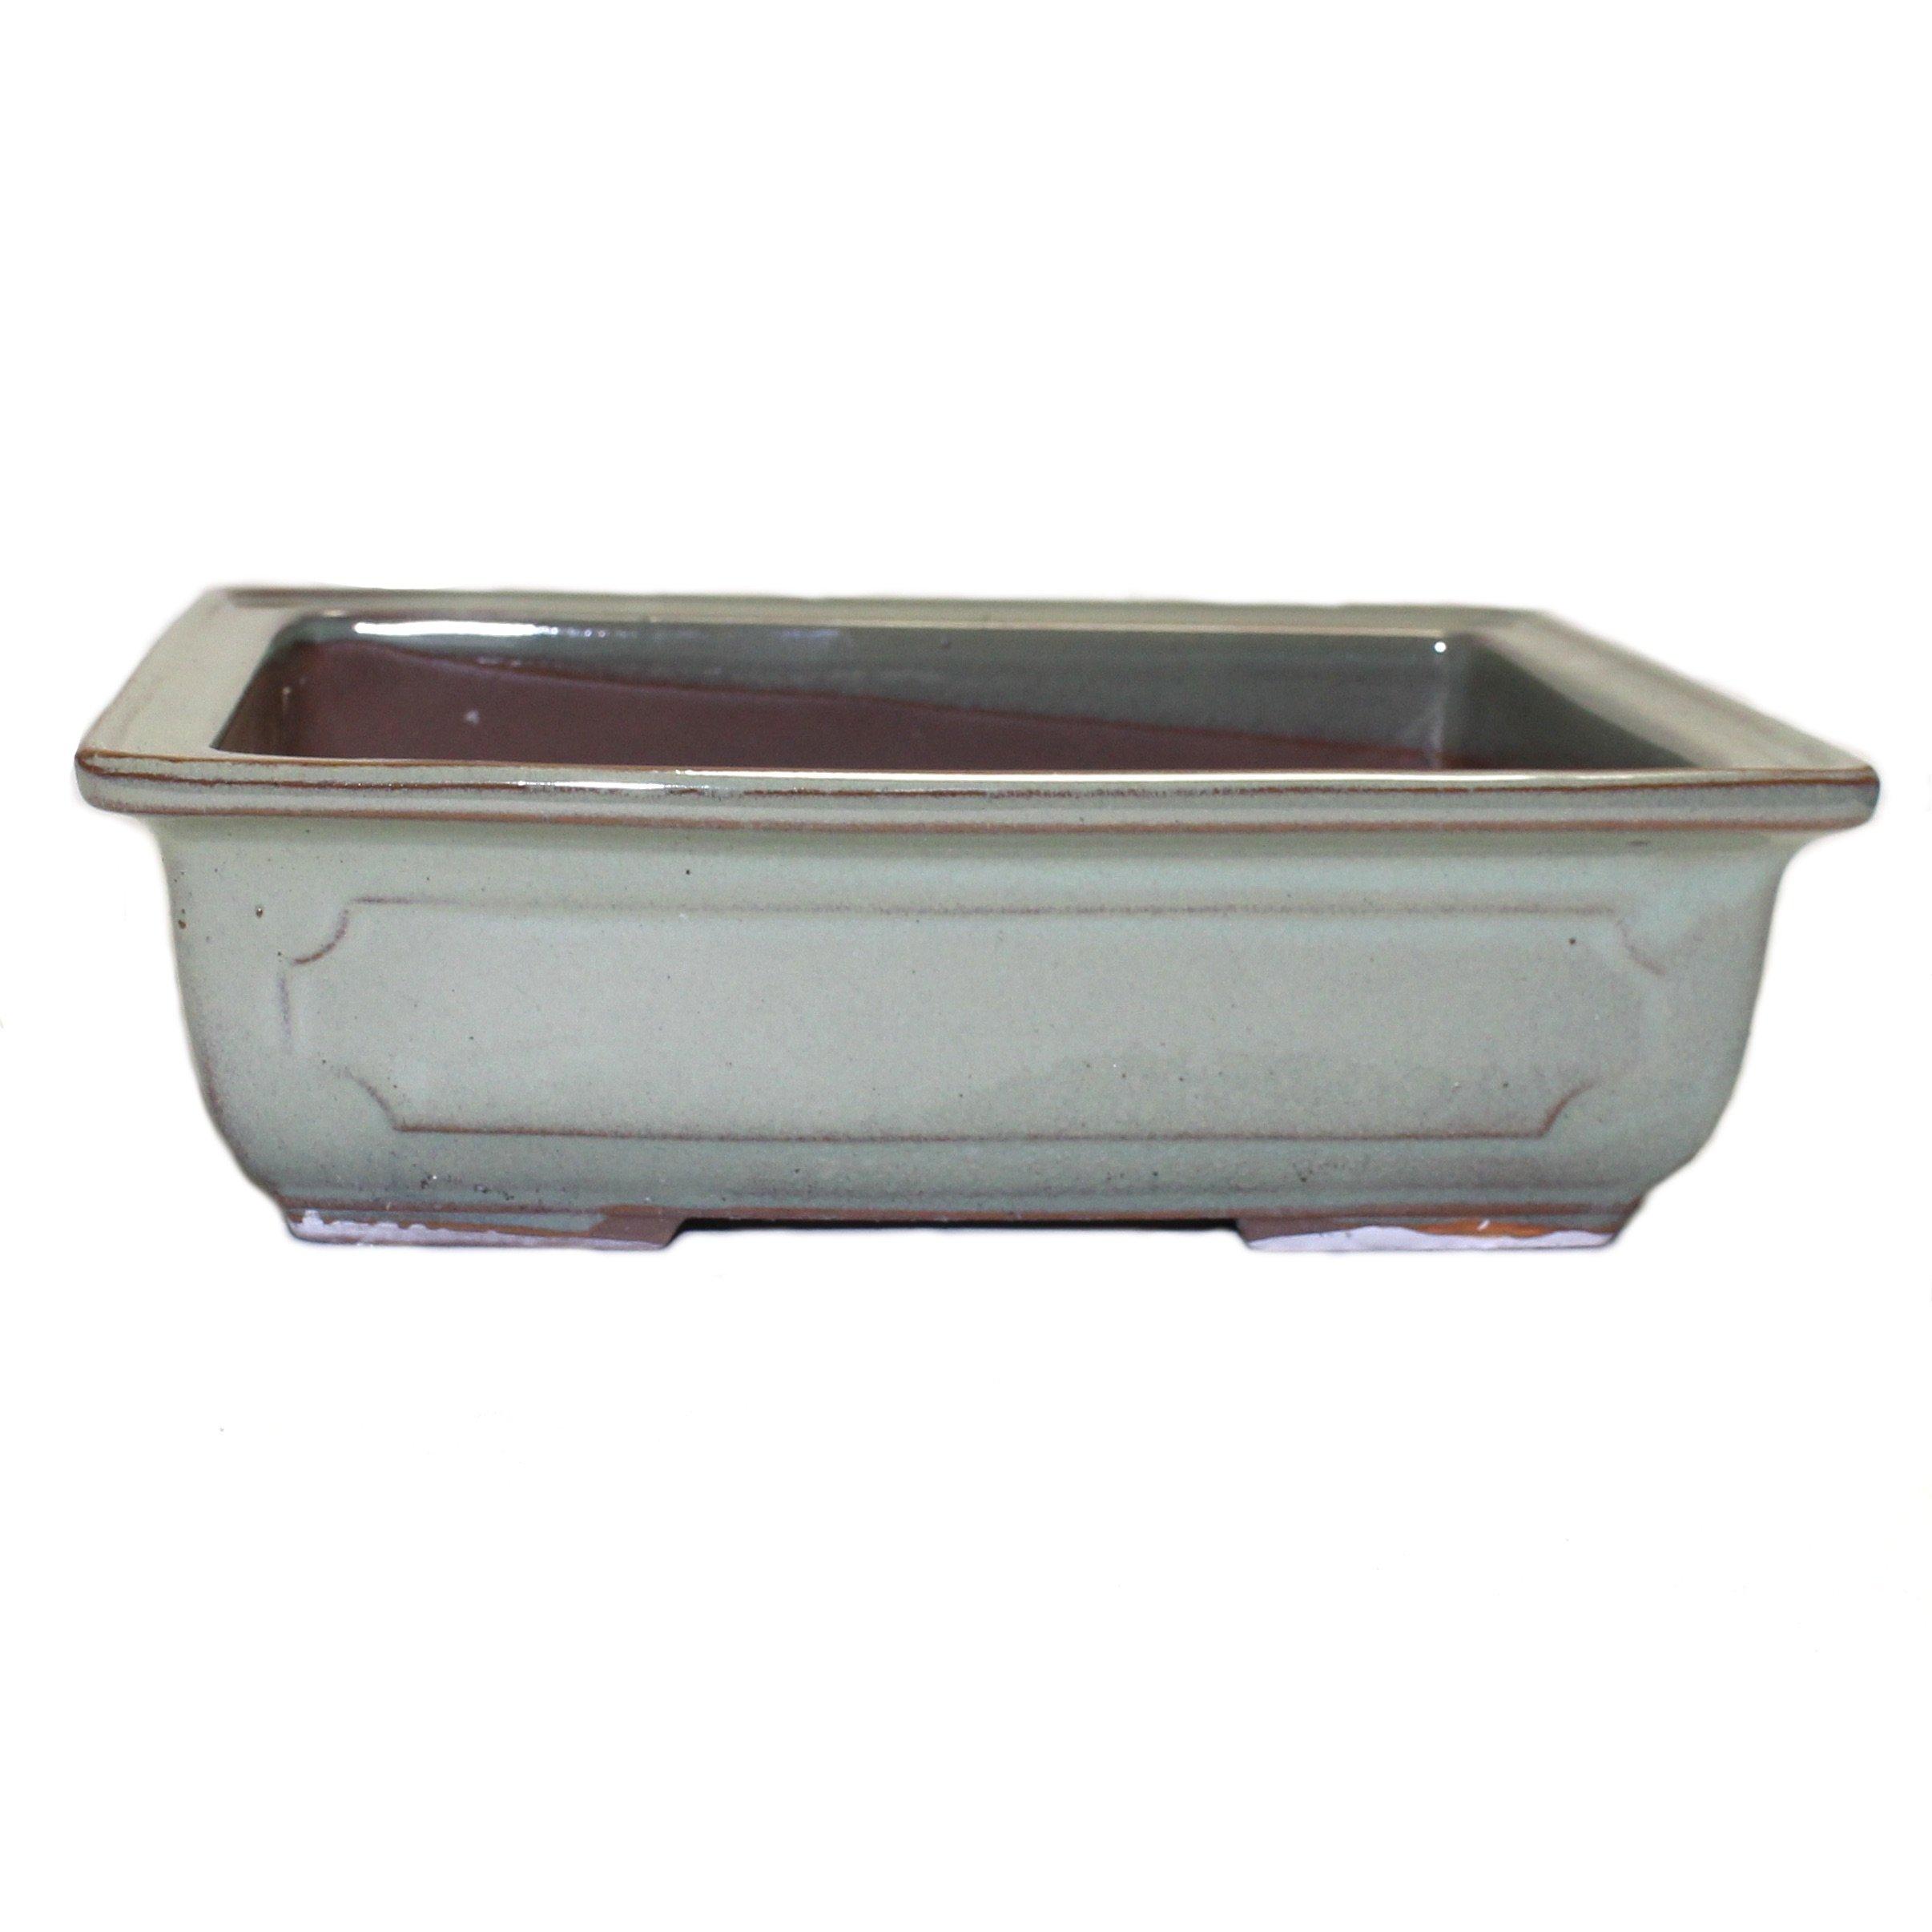 Bonsai Pot Ceramic Rectangle Window Shaped Decorations (7.6'', Oribe-Yu)